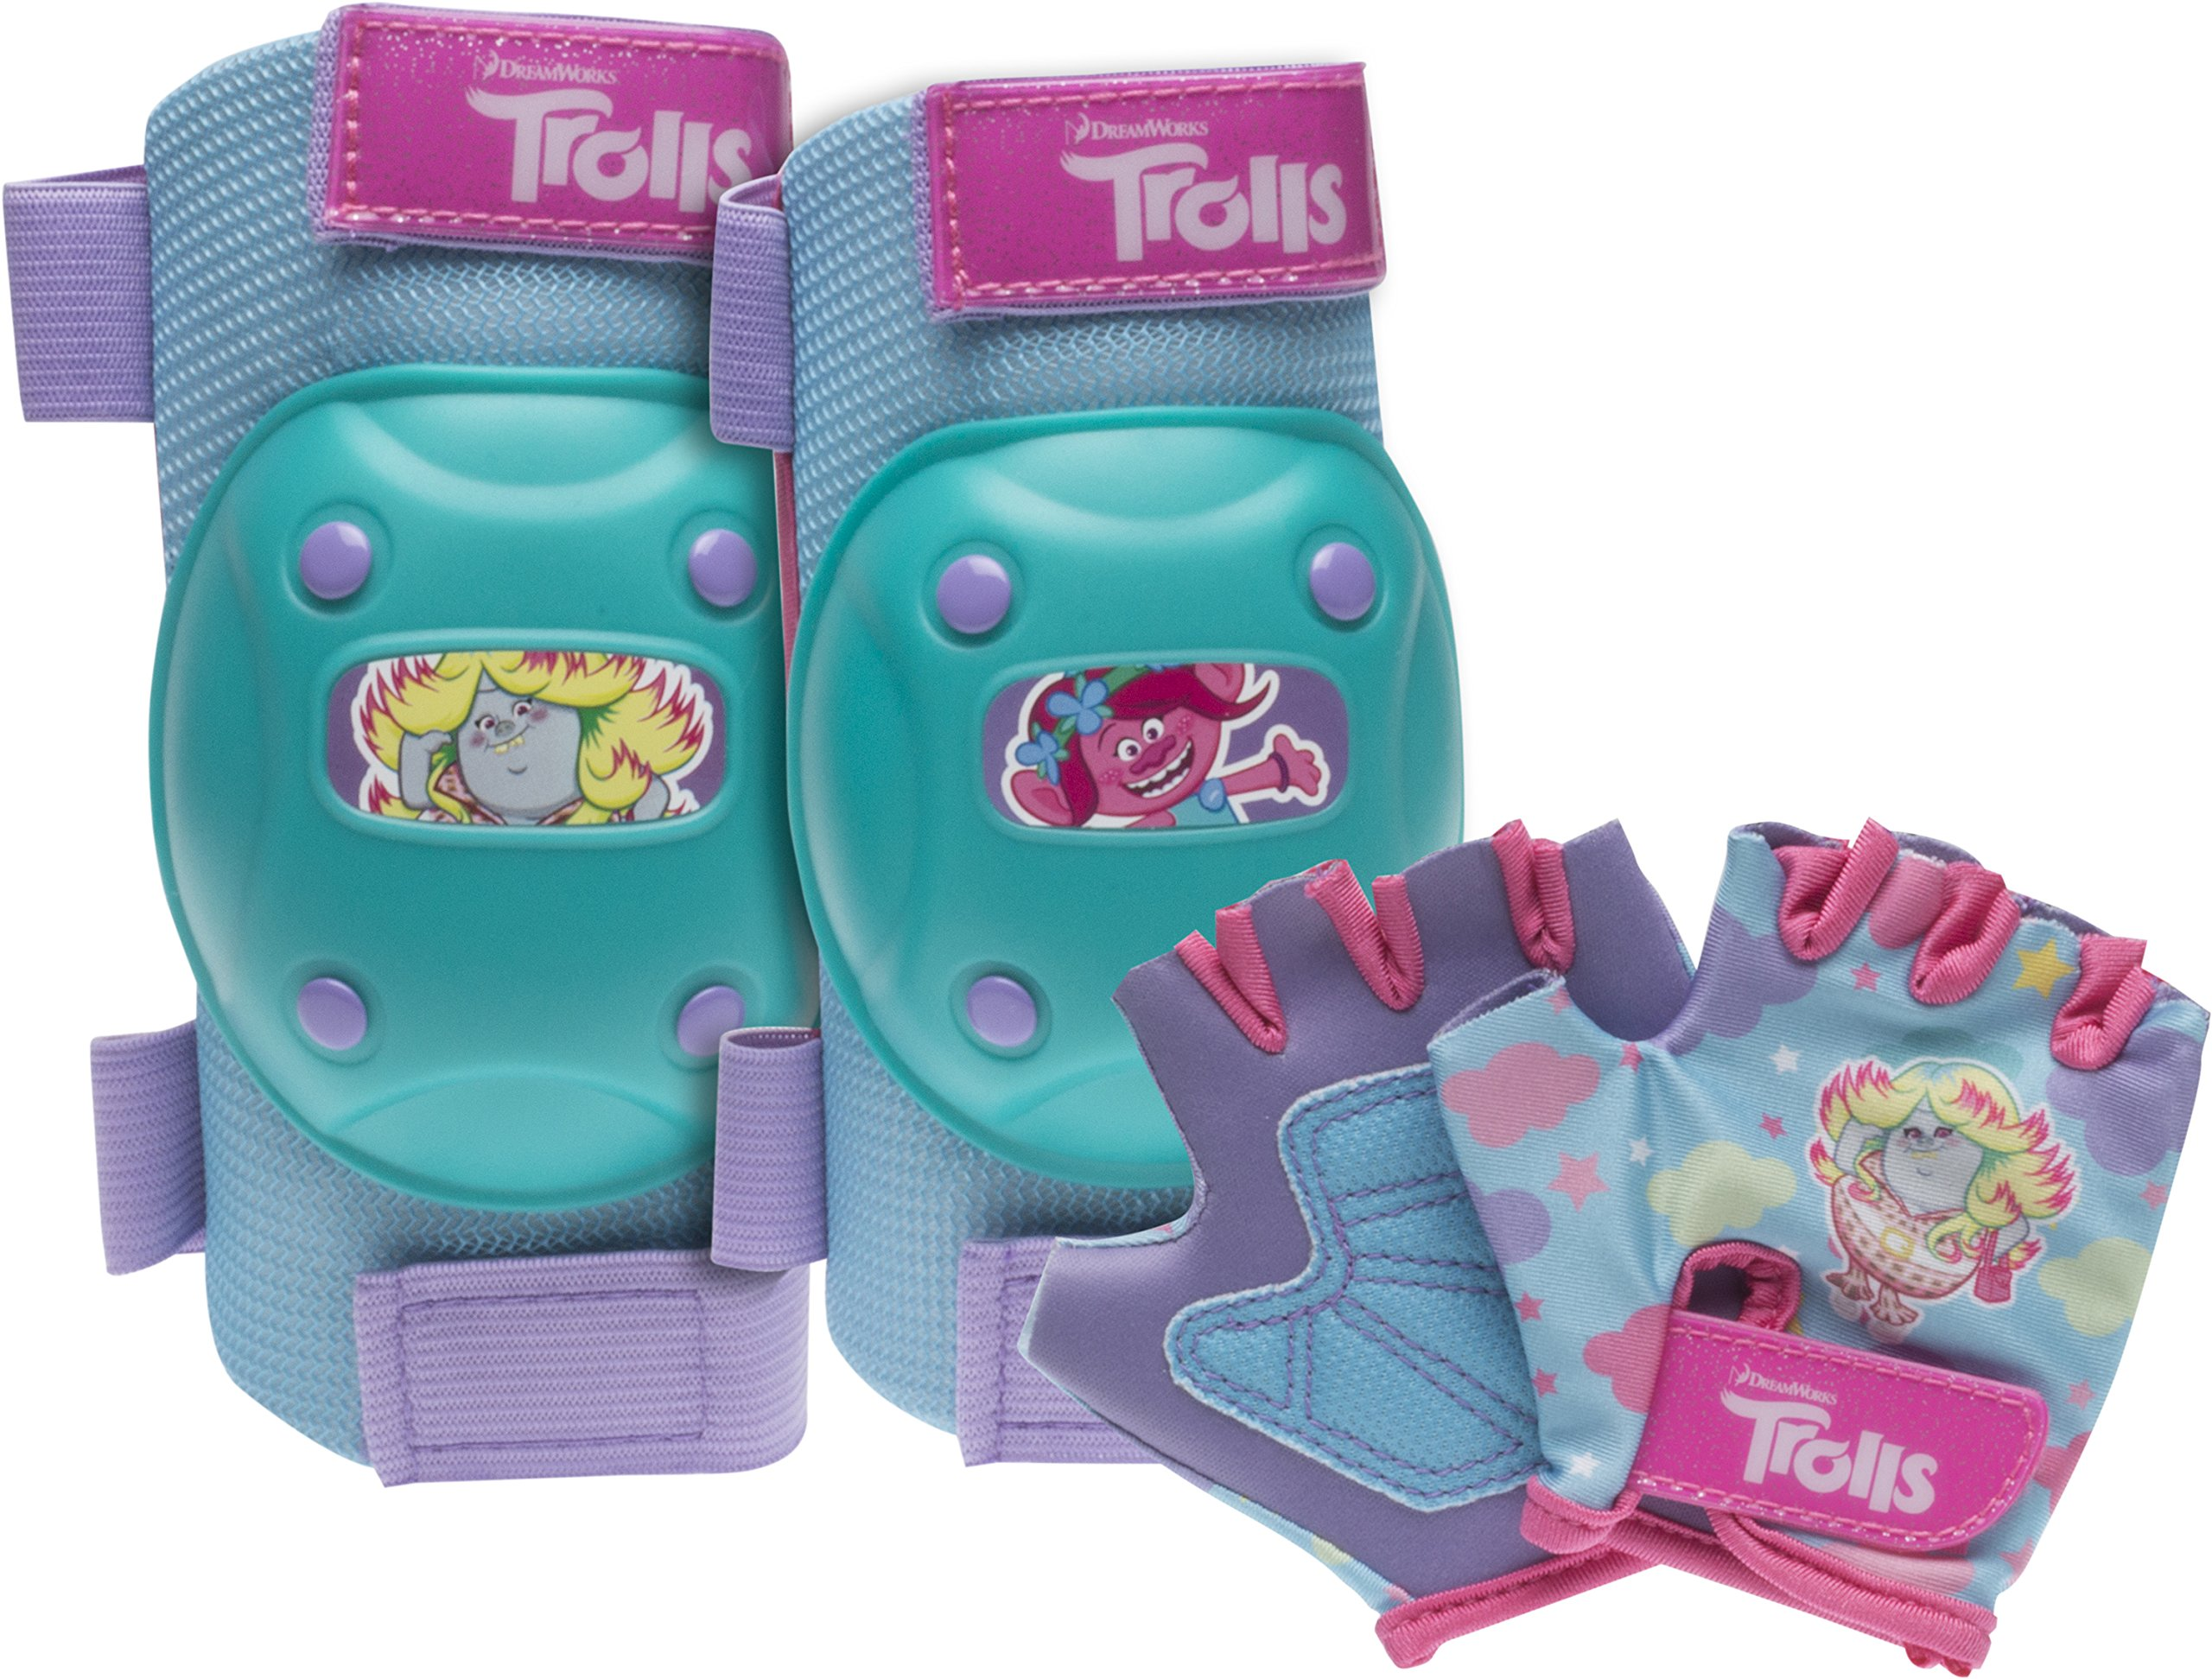 Bell Trolls Poppy Pad & Glove Set by Bell